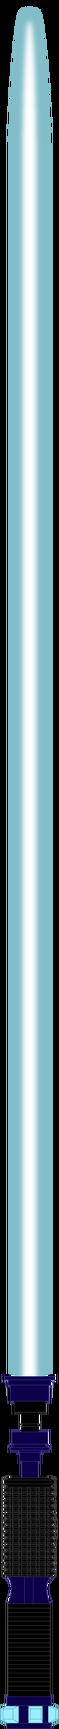 Yuna's Lightsaber